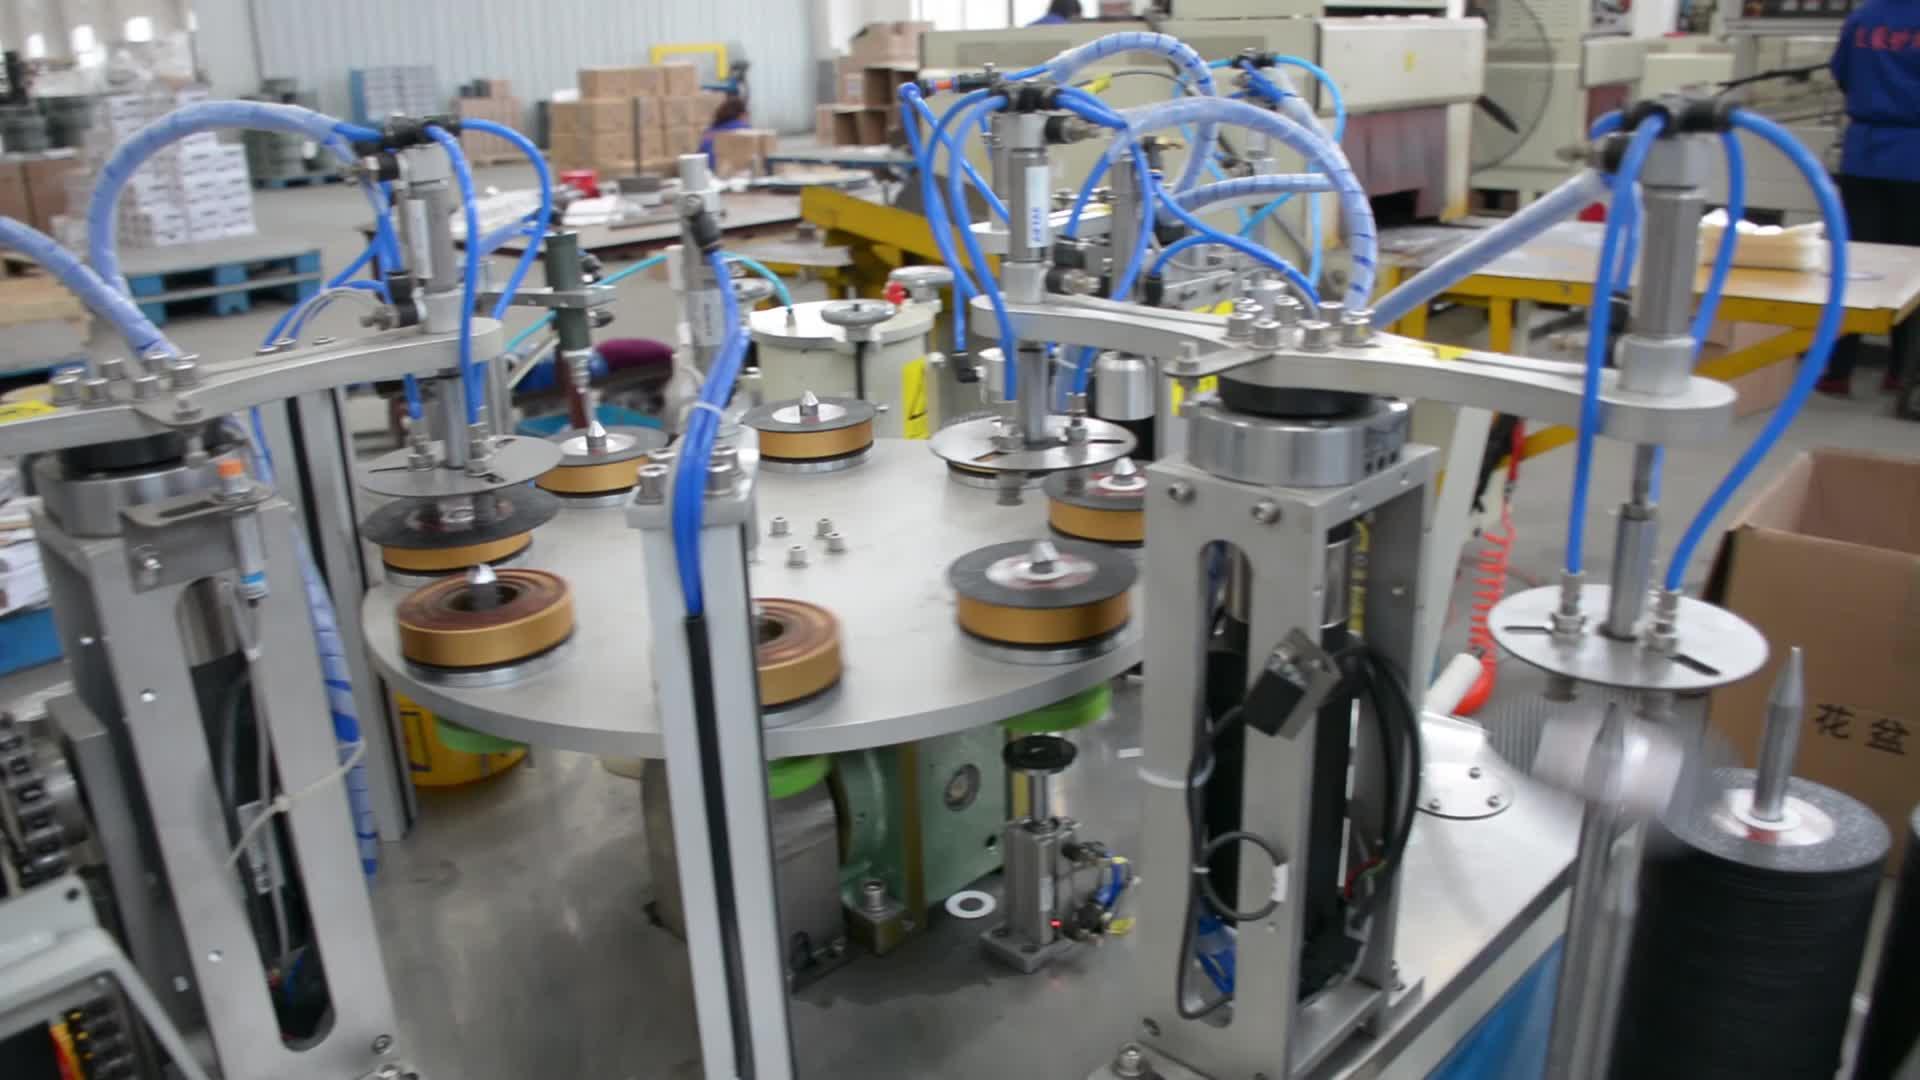 Großhandel 4 Zoll Aluminium Oxid trennscheibe schneiden rad